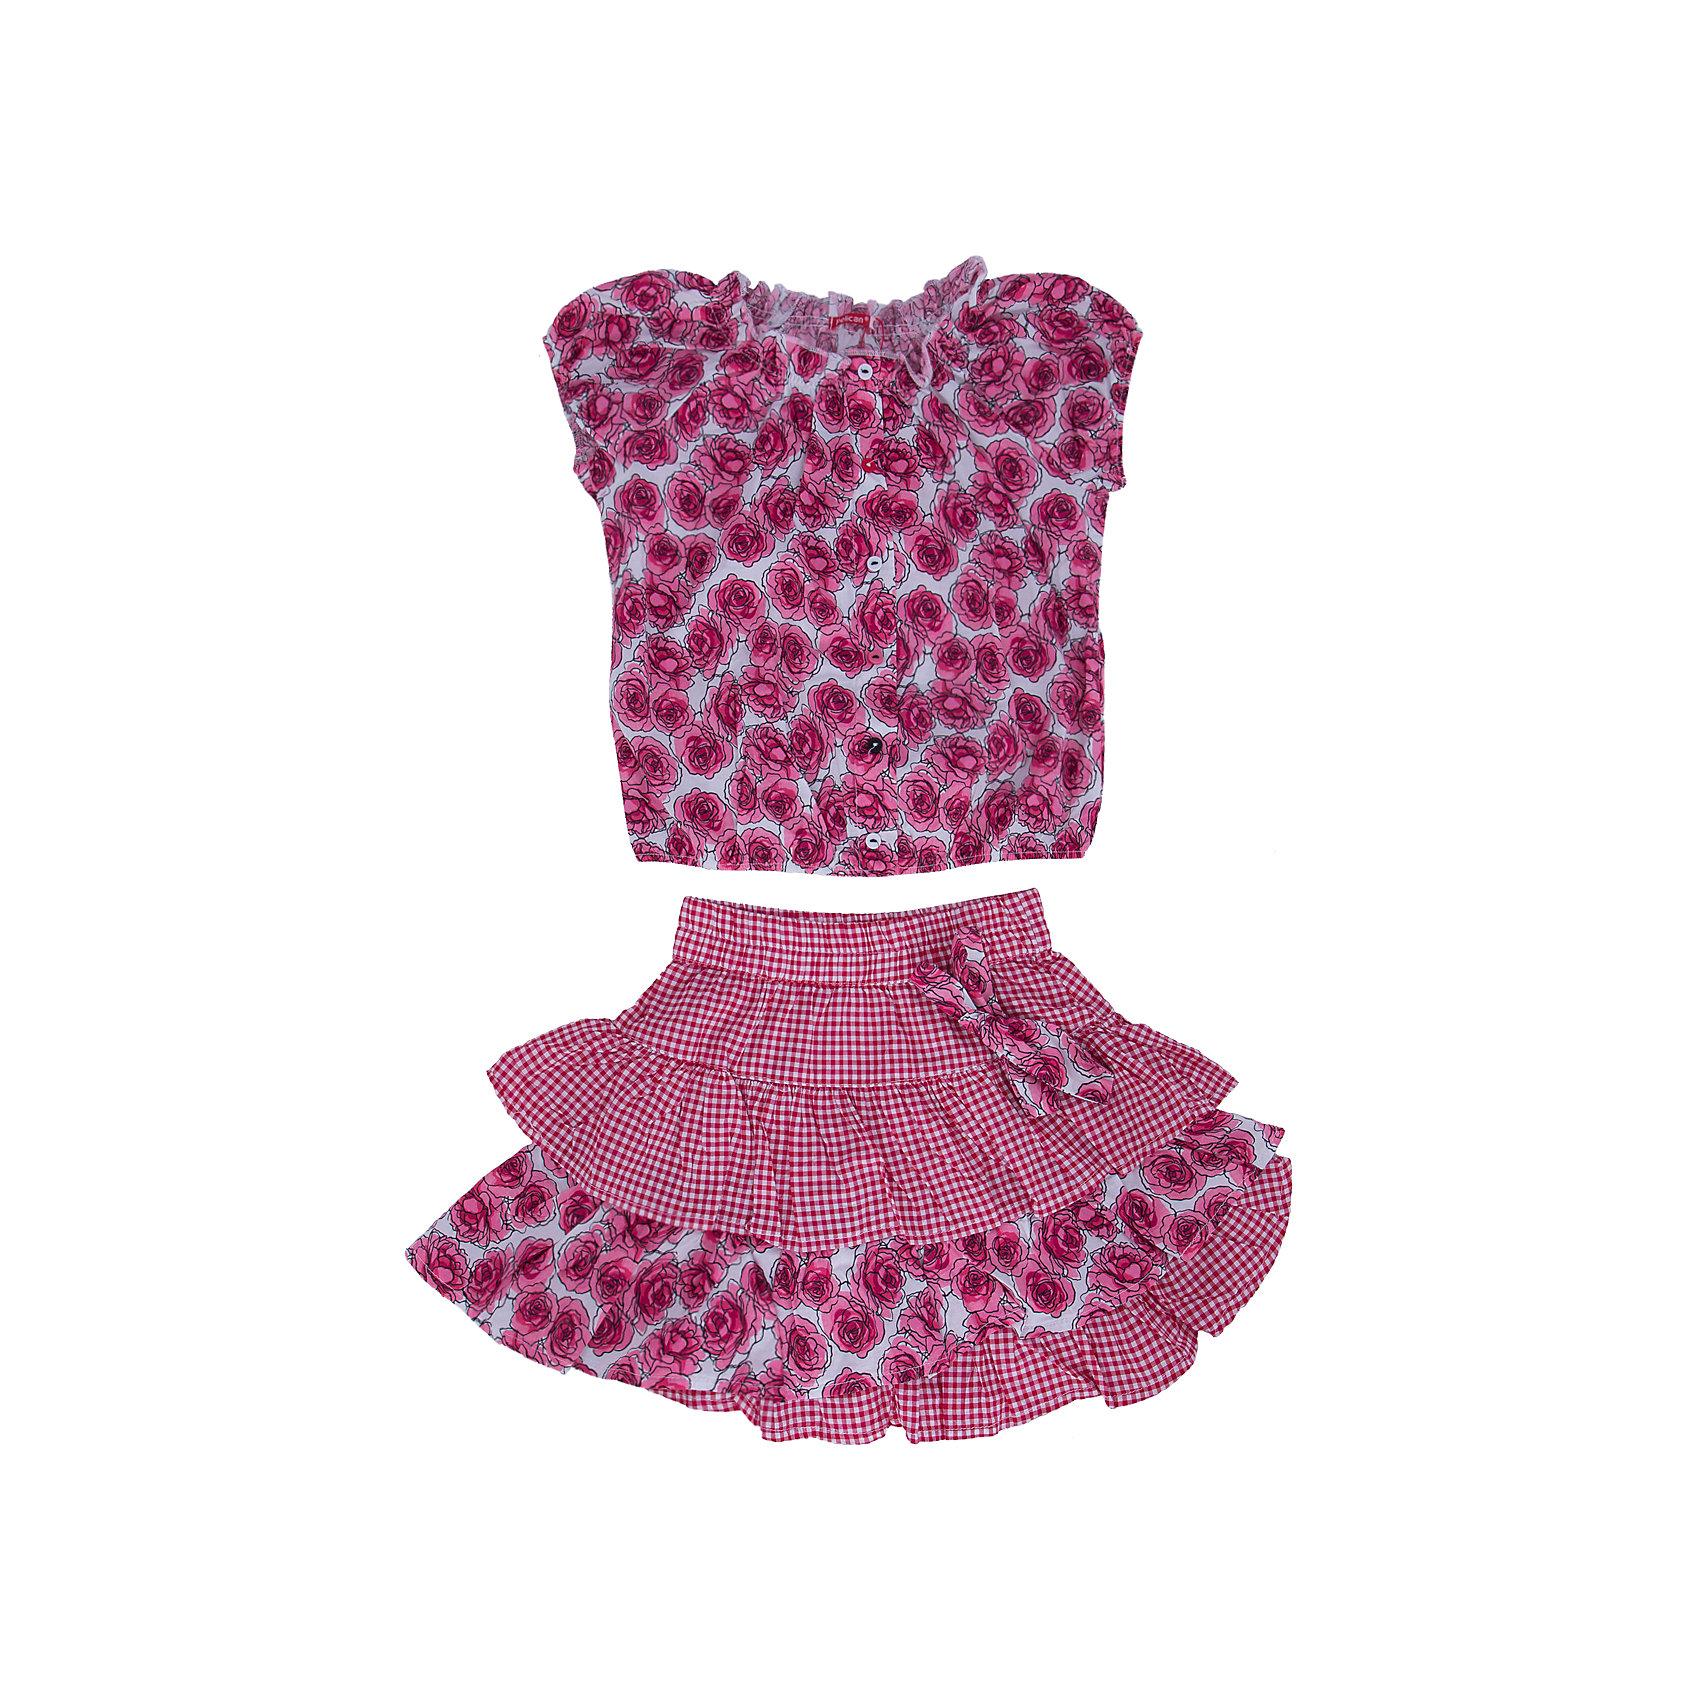 PELICAN Комплект: блузка и юбка для девочки PELICAN